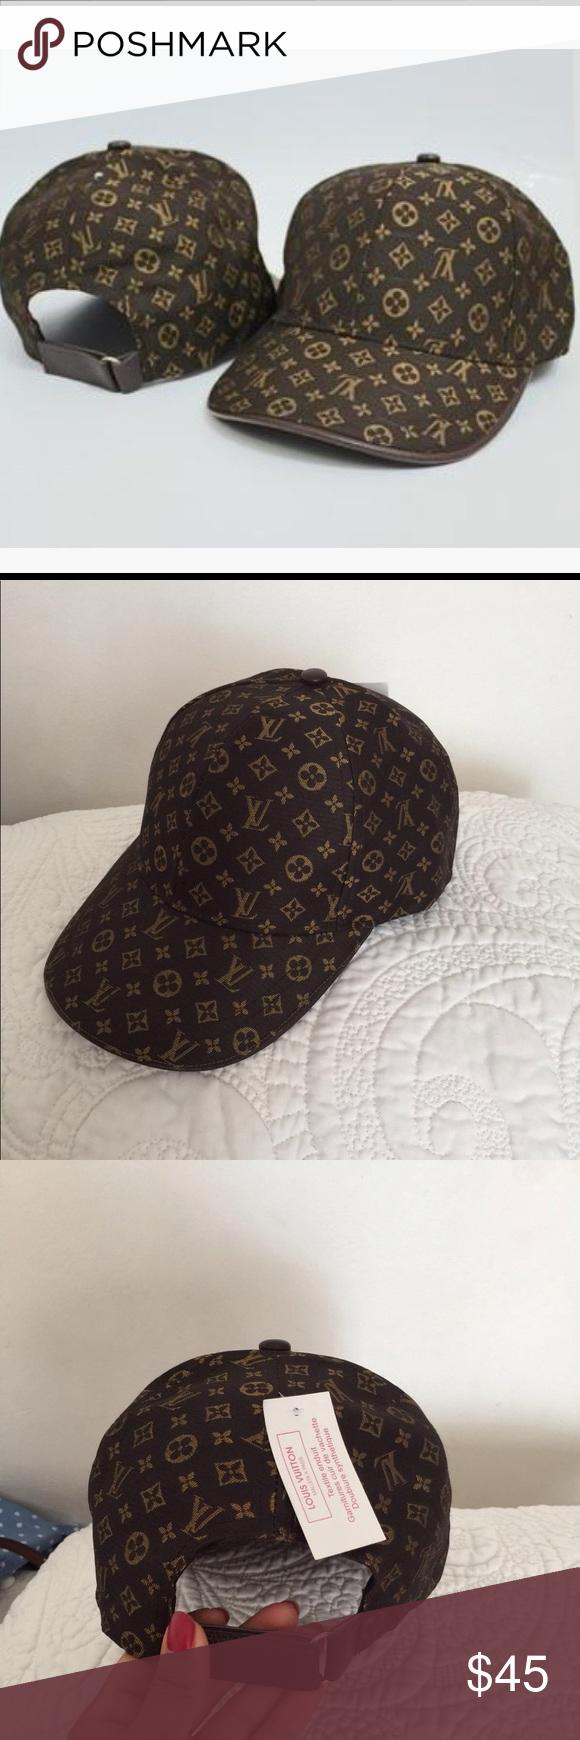 ef54e22aee1 NWT LV hat USA 2017 New Hat